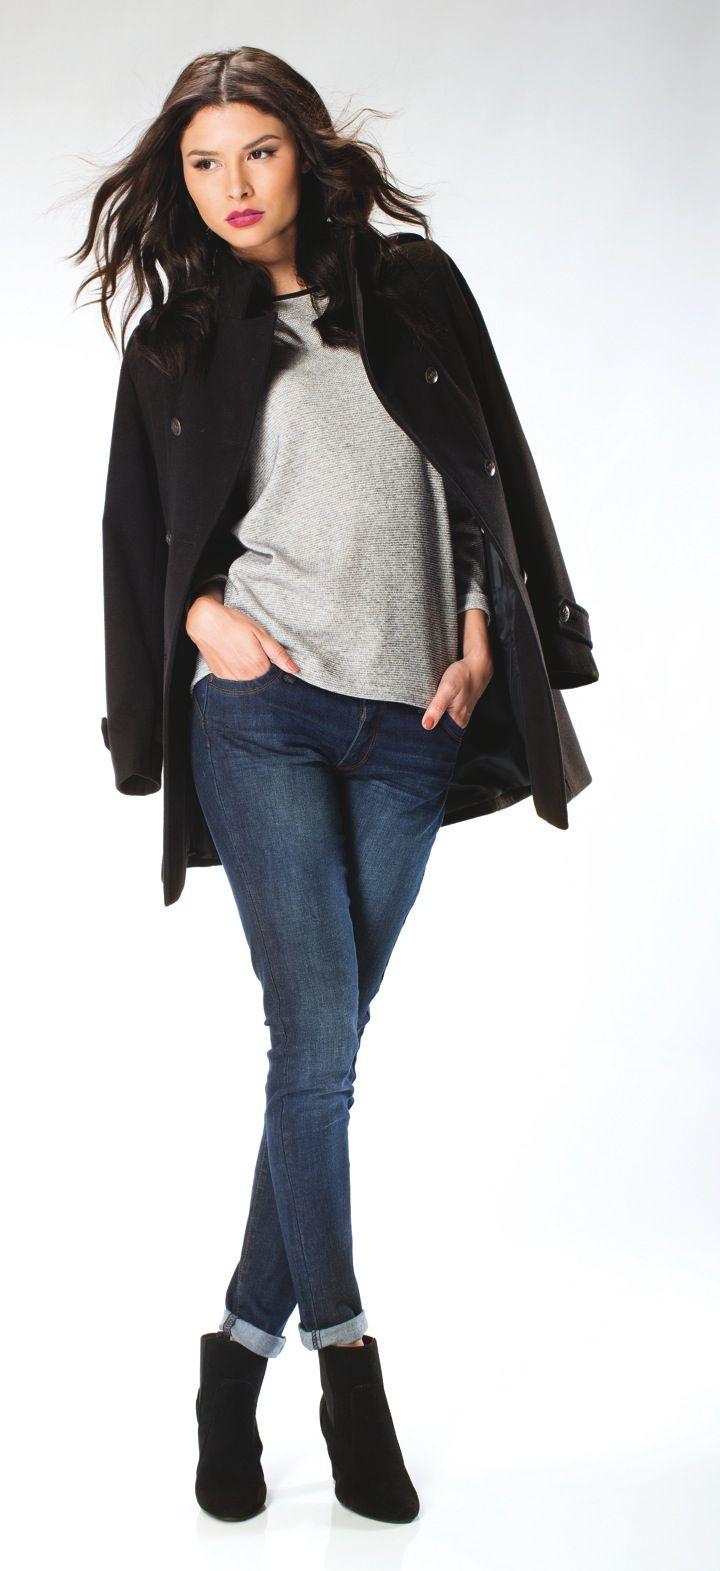 High Heels! #MO #fashion #style @strandbulgaria http://bit.ly/MOComing